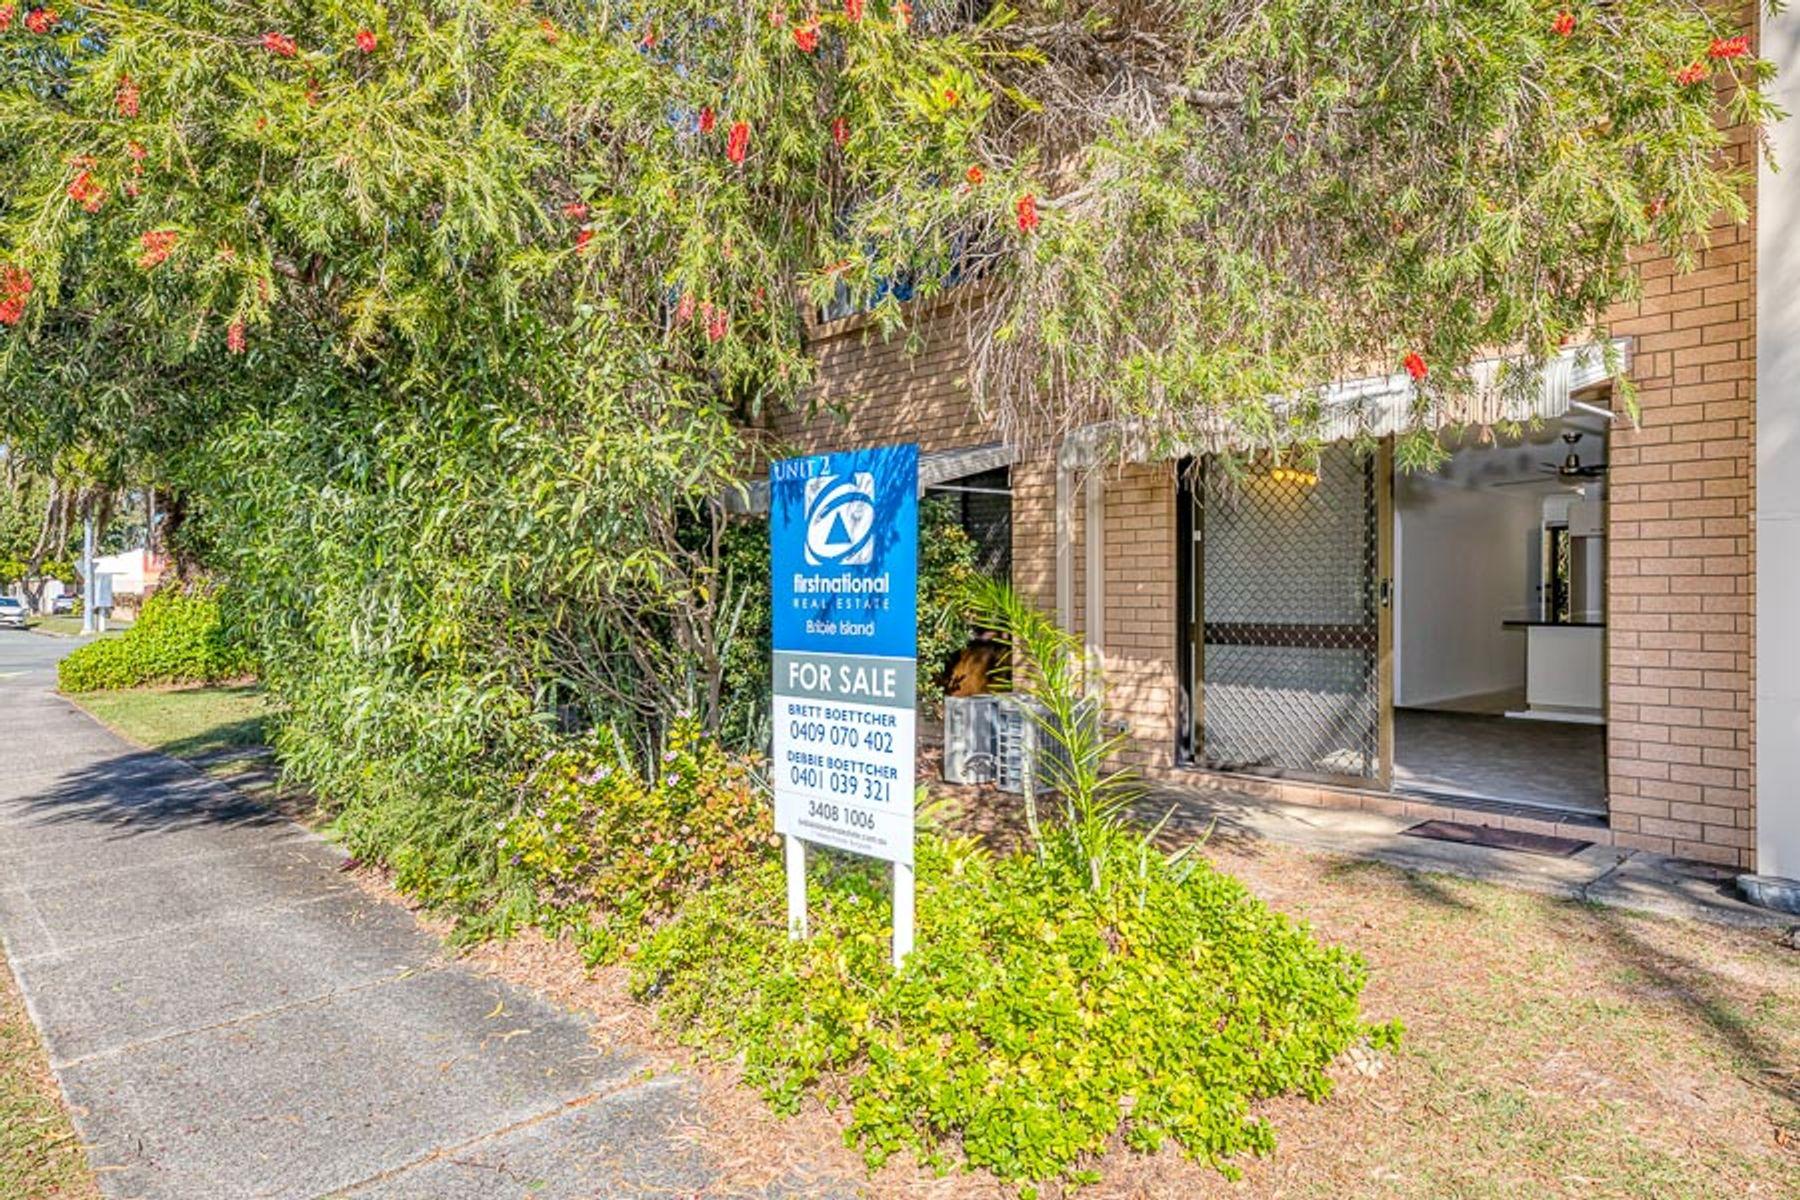 2/9 Hall Avenue, Bongaree, QLD 4507